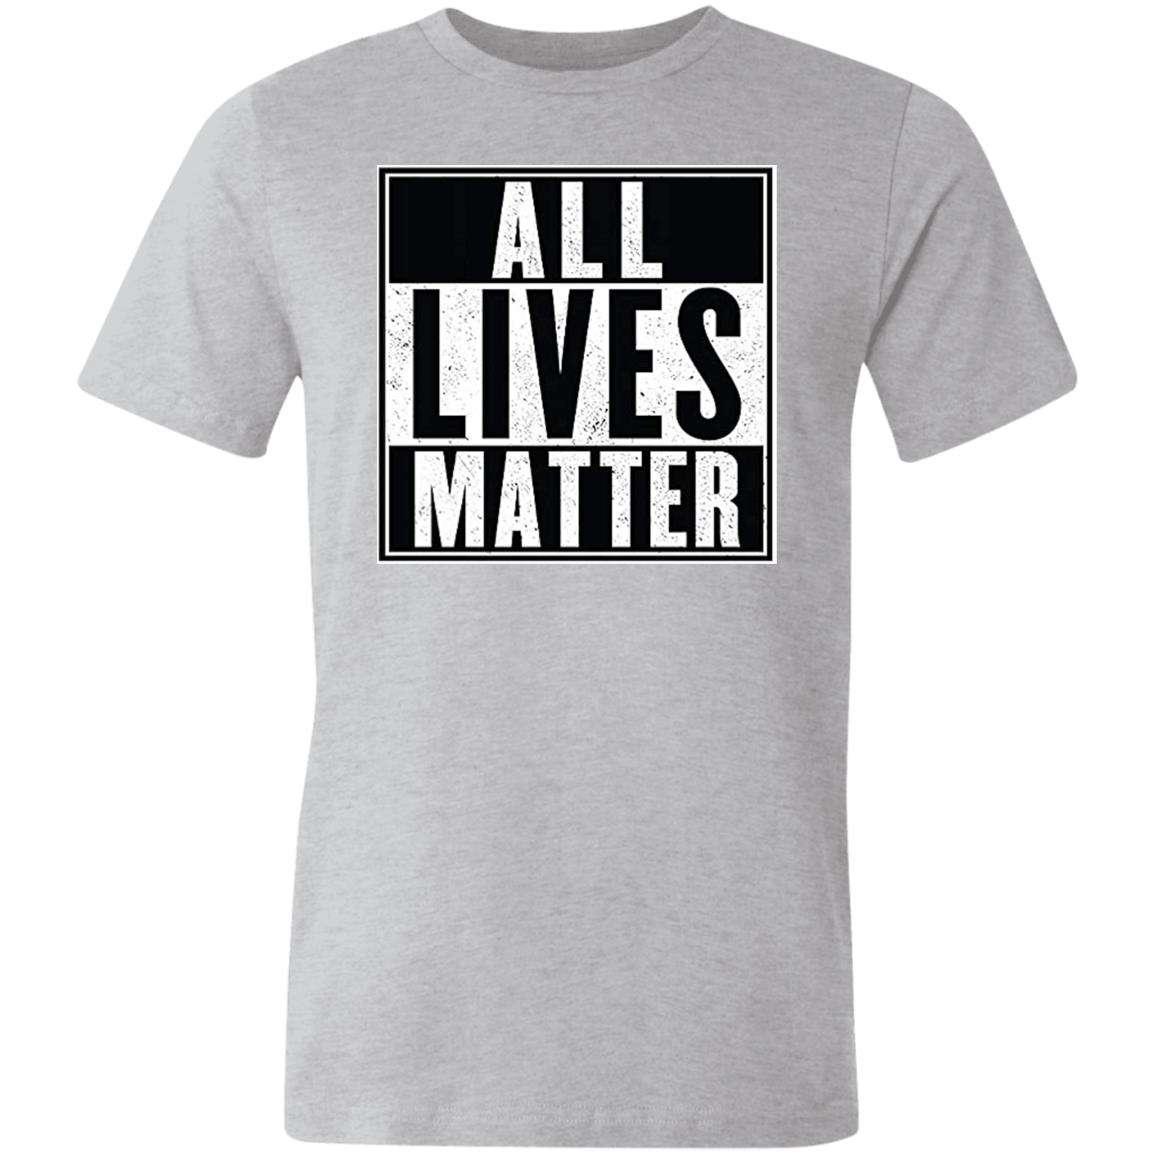 All Lives Matter Tee (6 Variants)